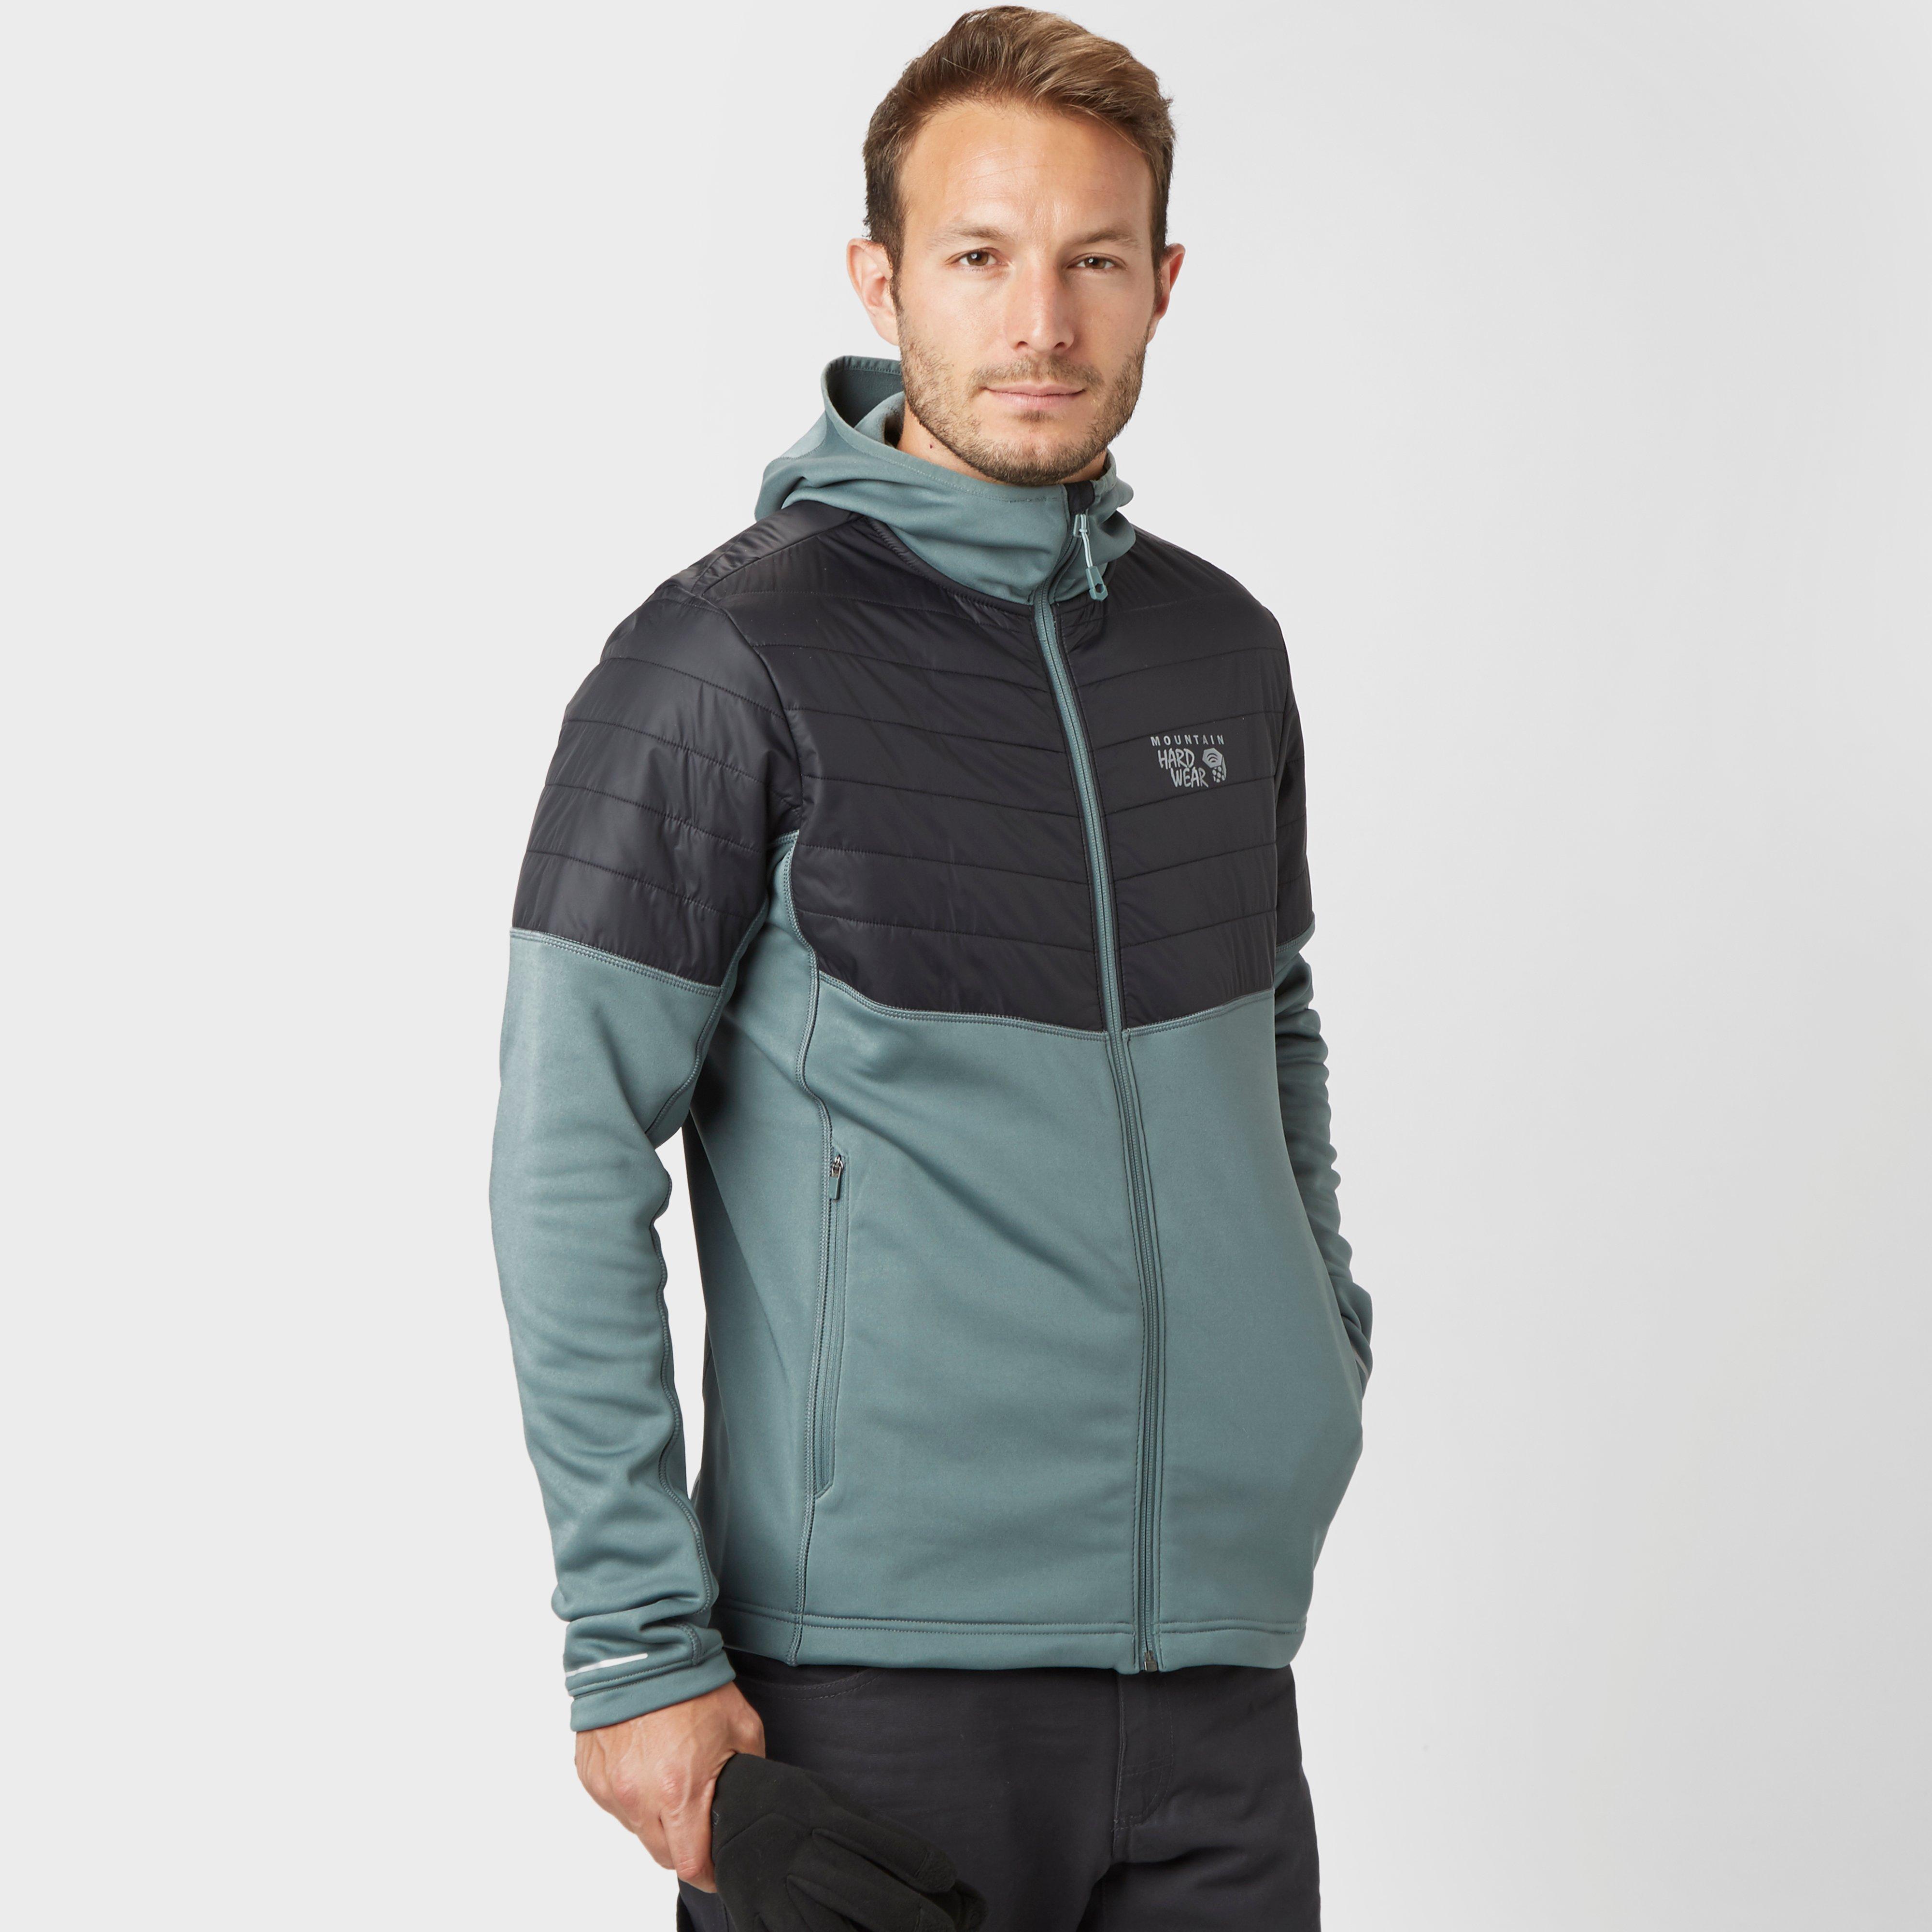 Mountain Hardwear Mens 32° Insulated Jacket Black